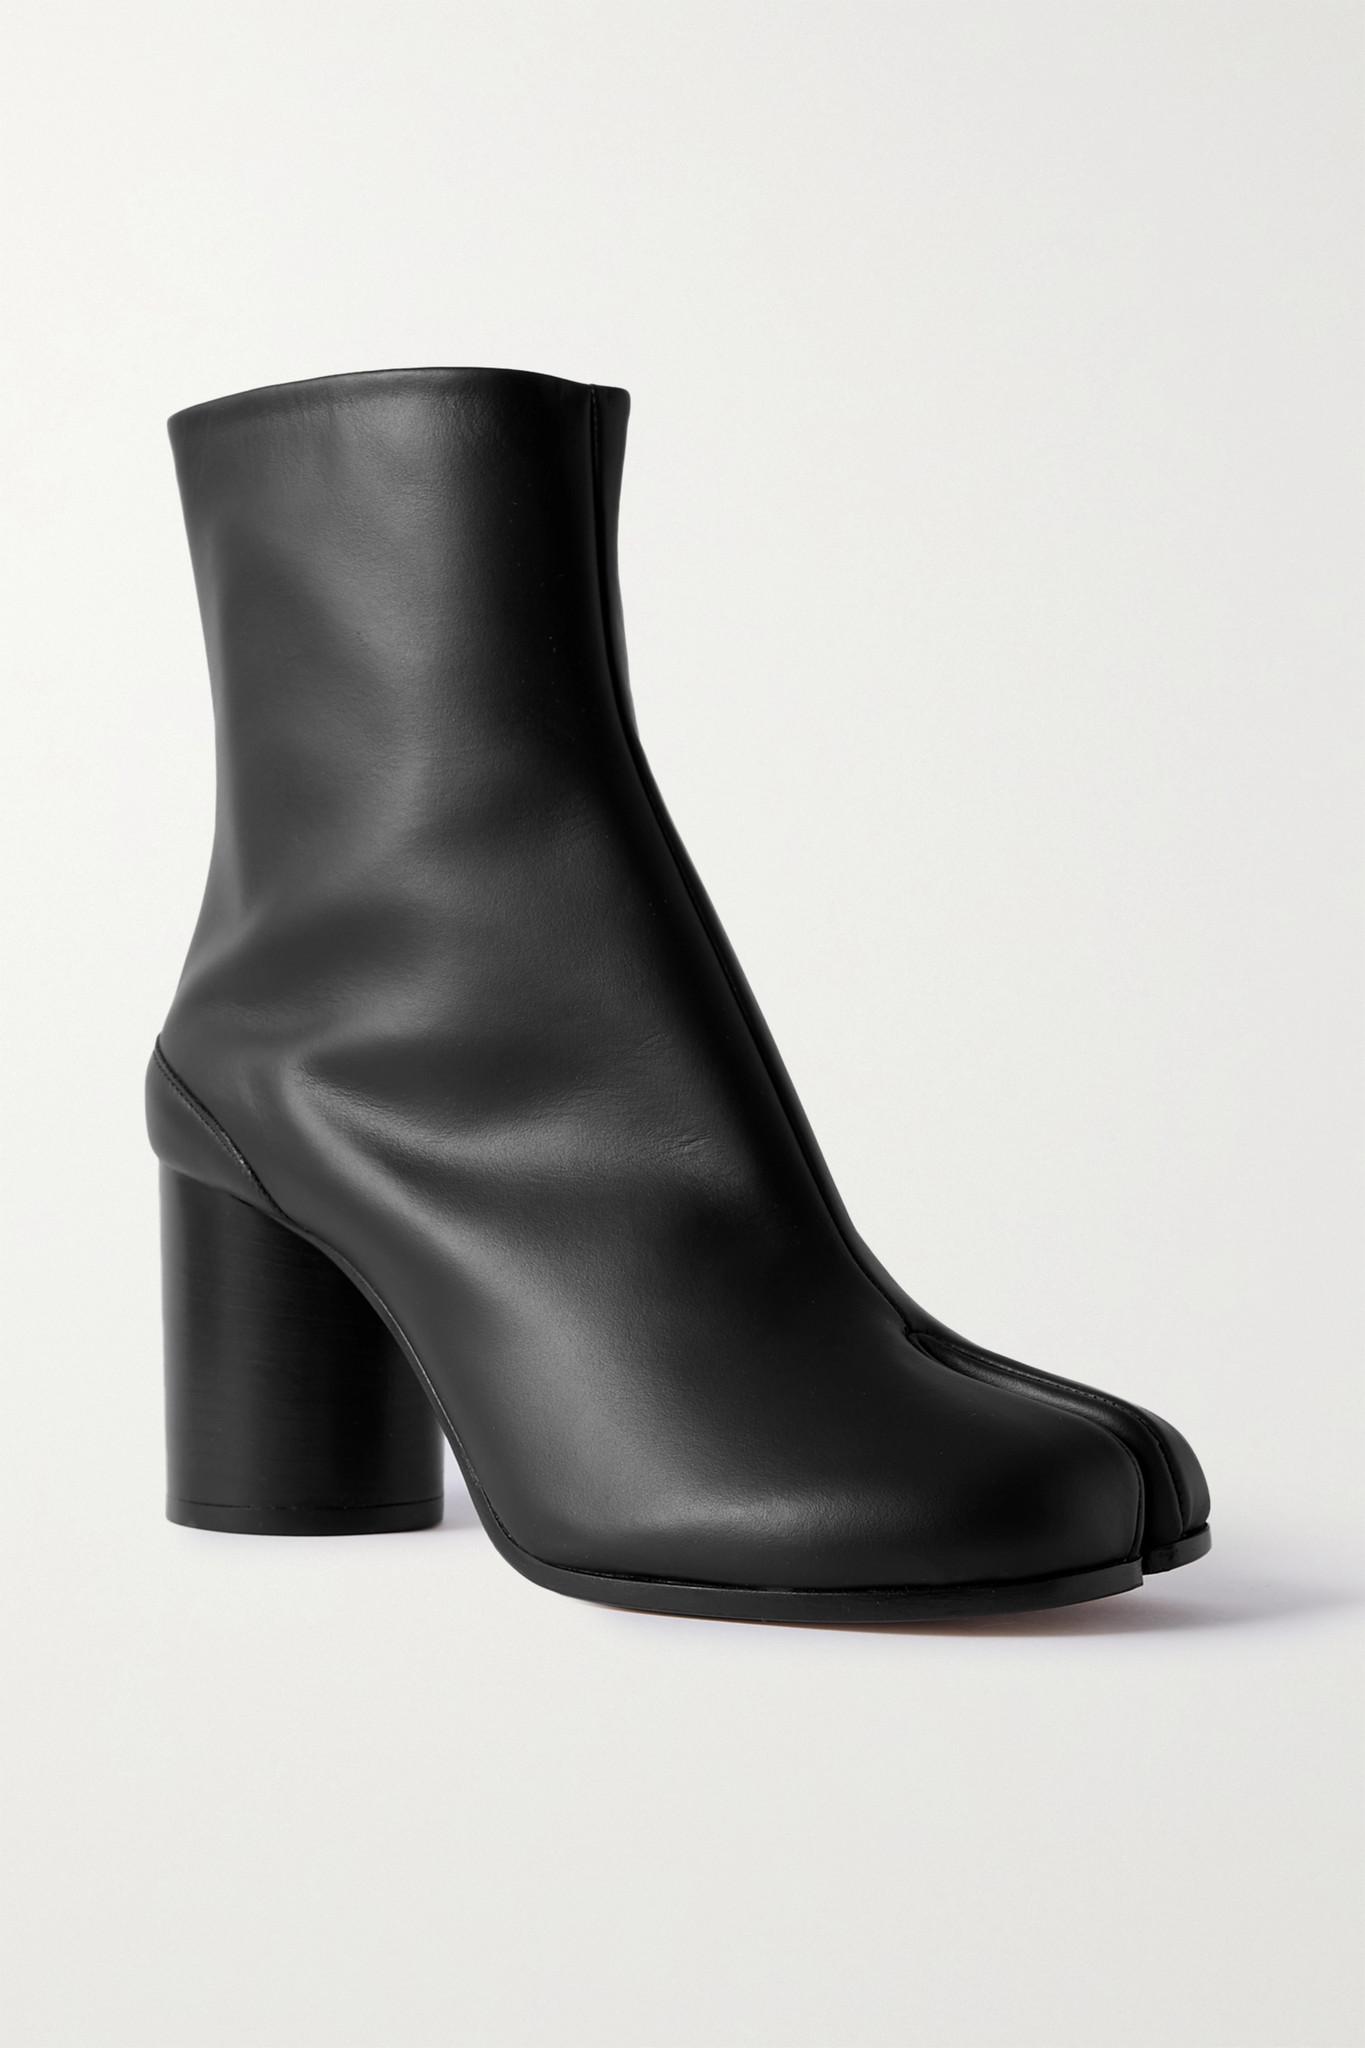 MAISON MARGIELA - Tabi 分趾皮革踝靴 - 黑色 - IT35.5